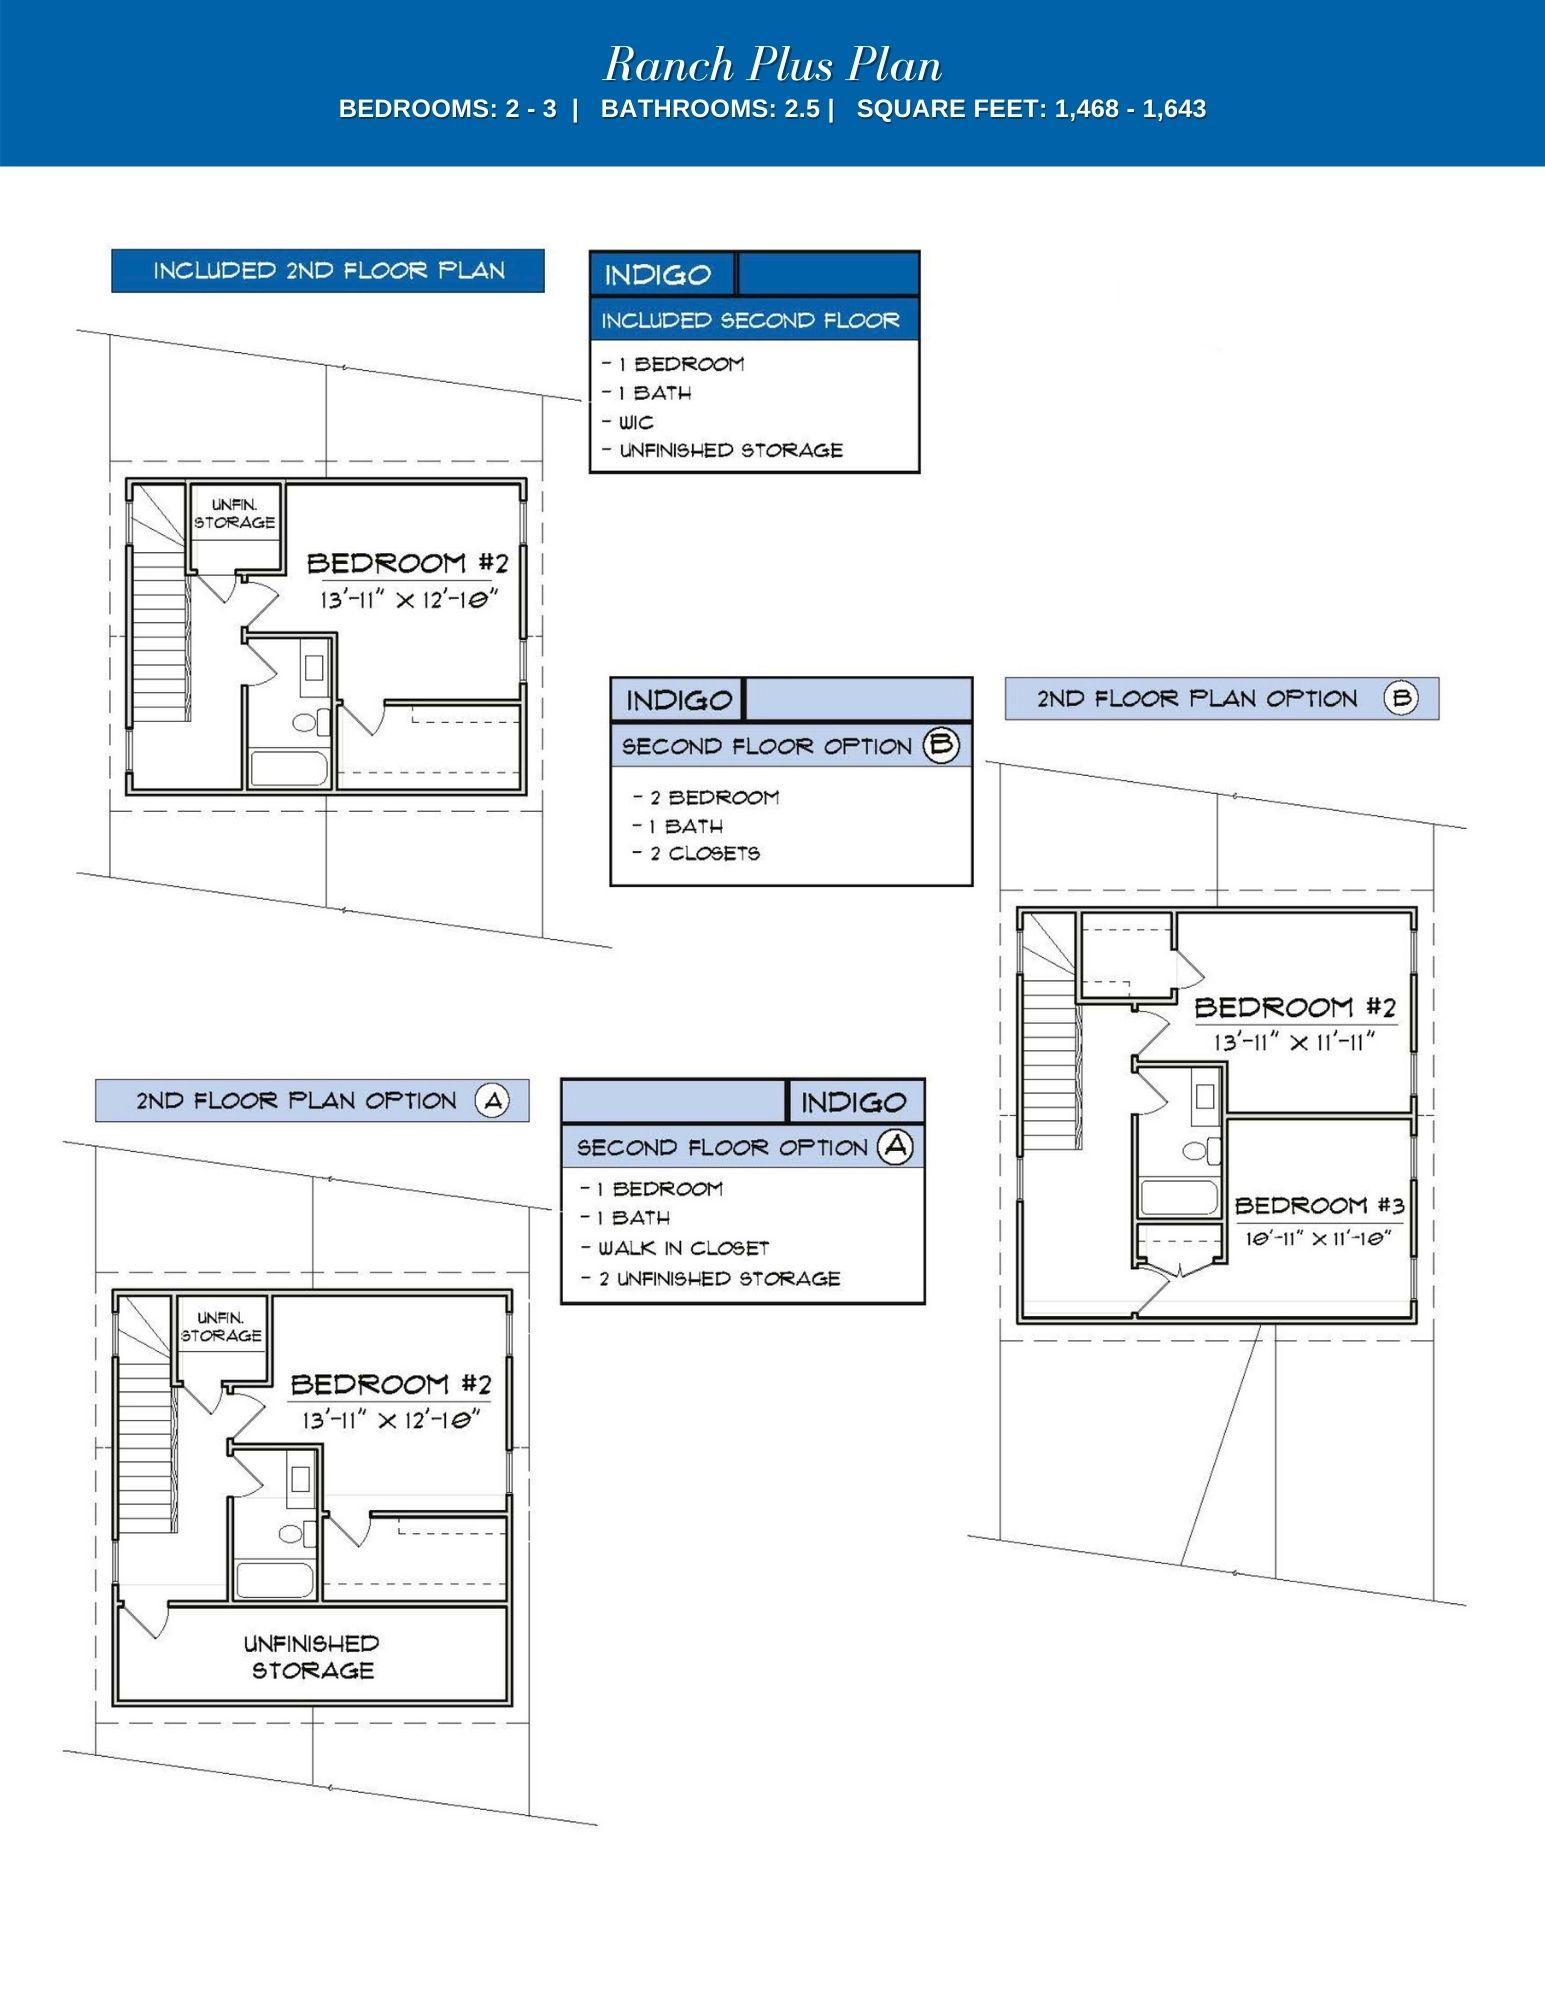 Indigo 2nd Floor Plan Options